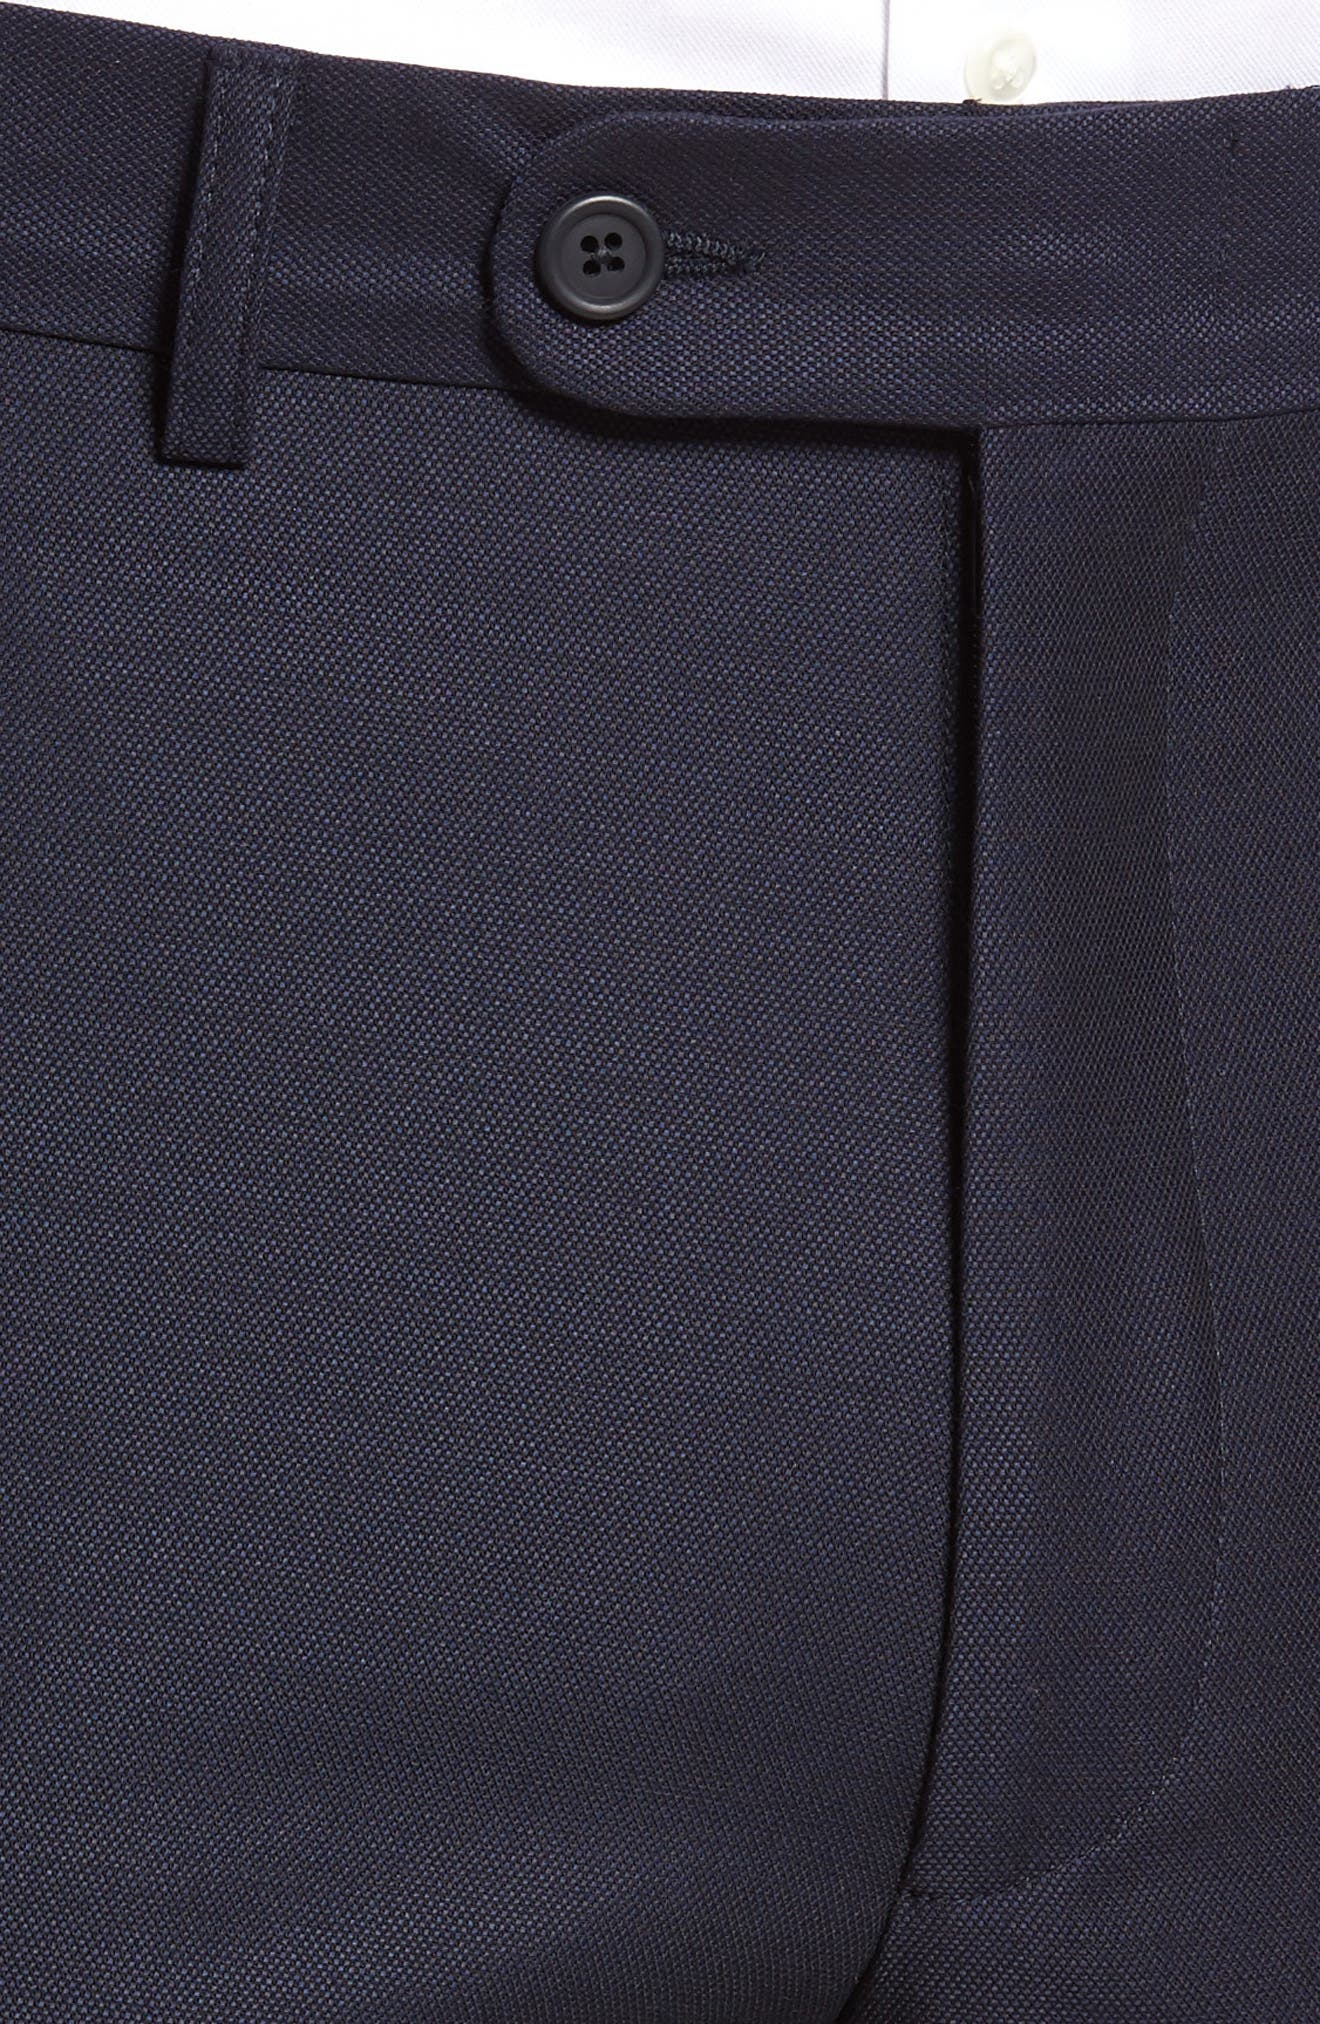 Alternate Image 4  - Bensol Pin Dot Wool Trousers